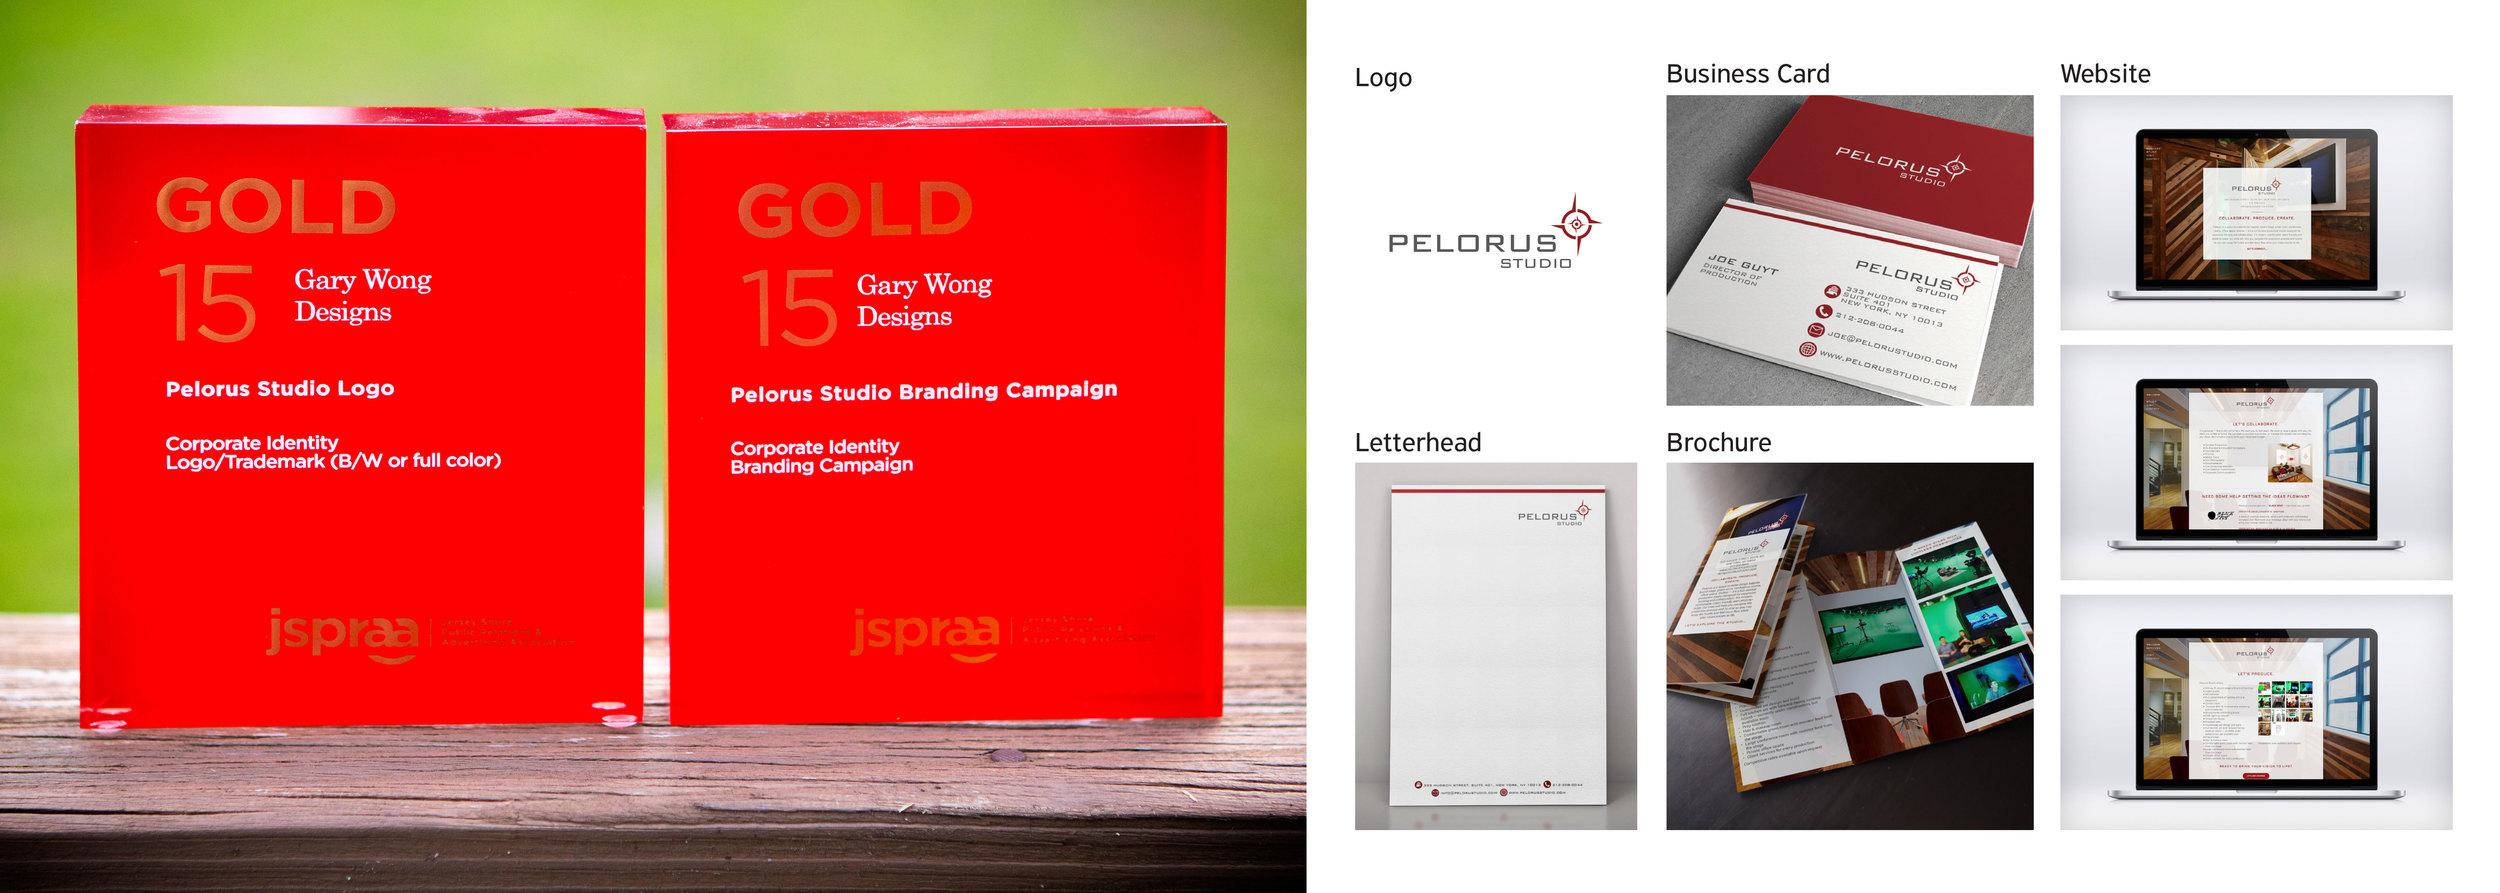 Client: Pelorus Studio Categories: Corporate Identity–Logo/Trademark; Corporate Identity–Branding Campaign